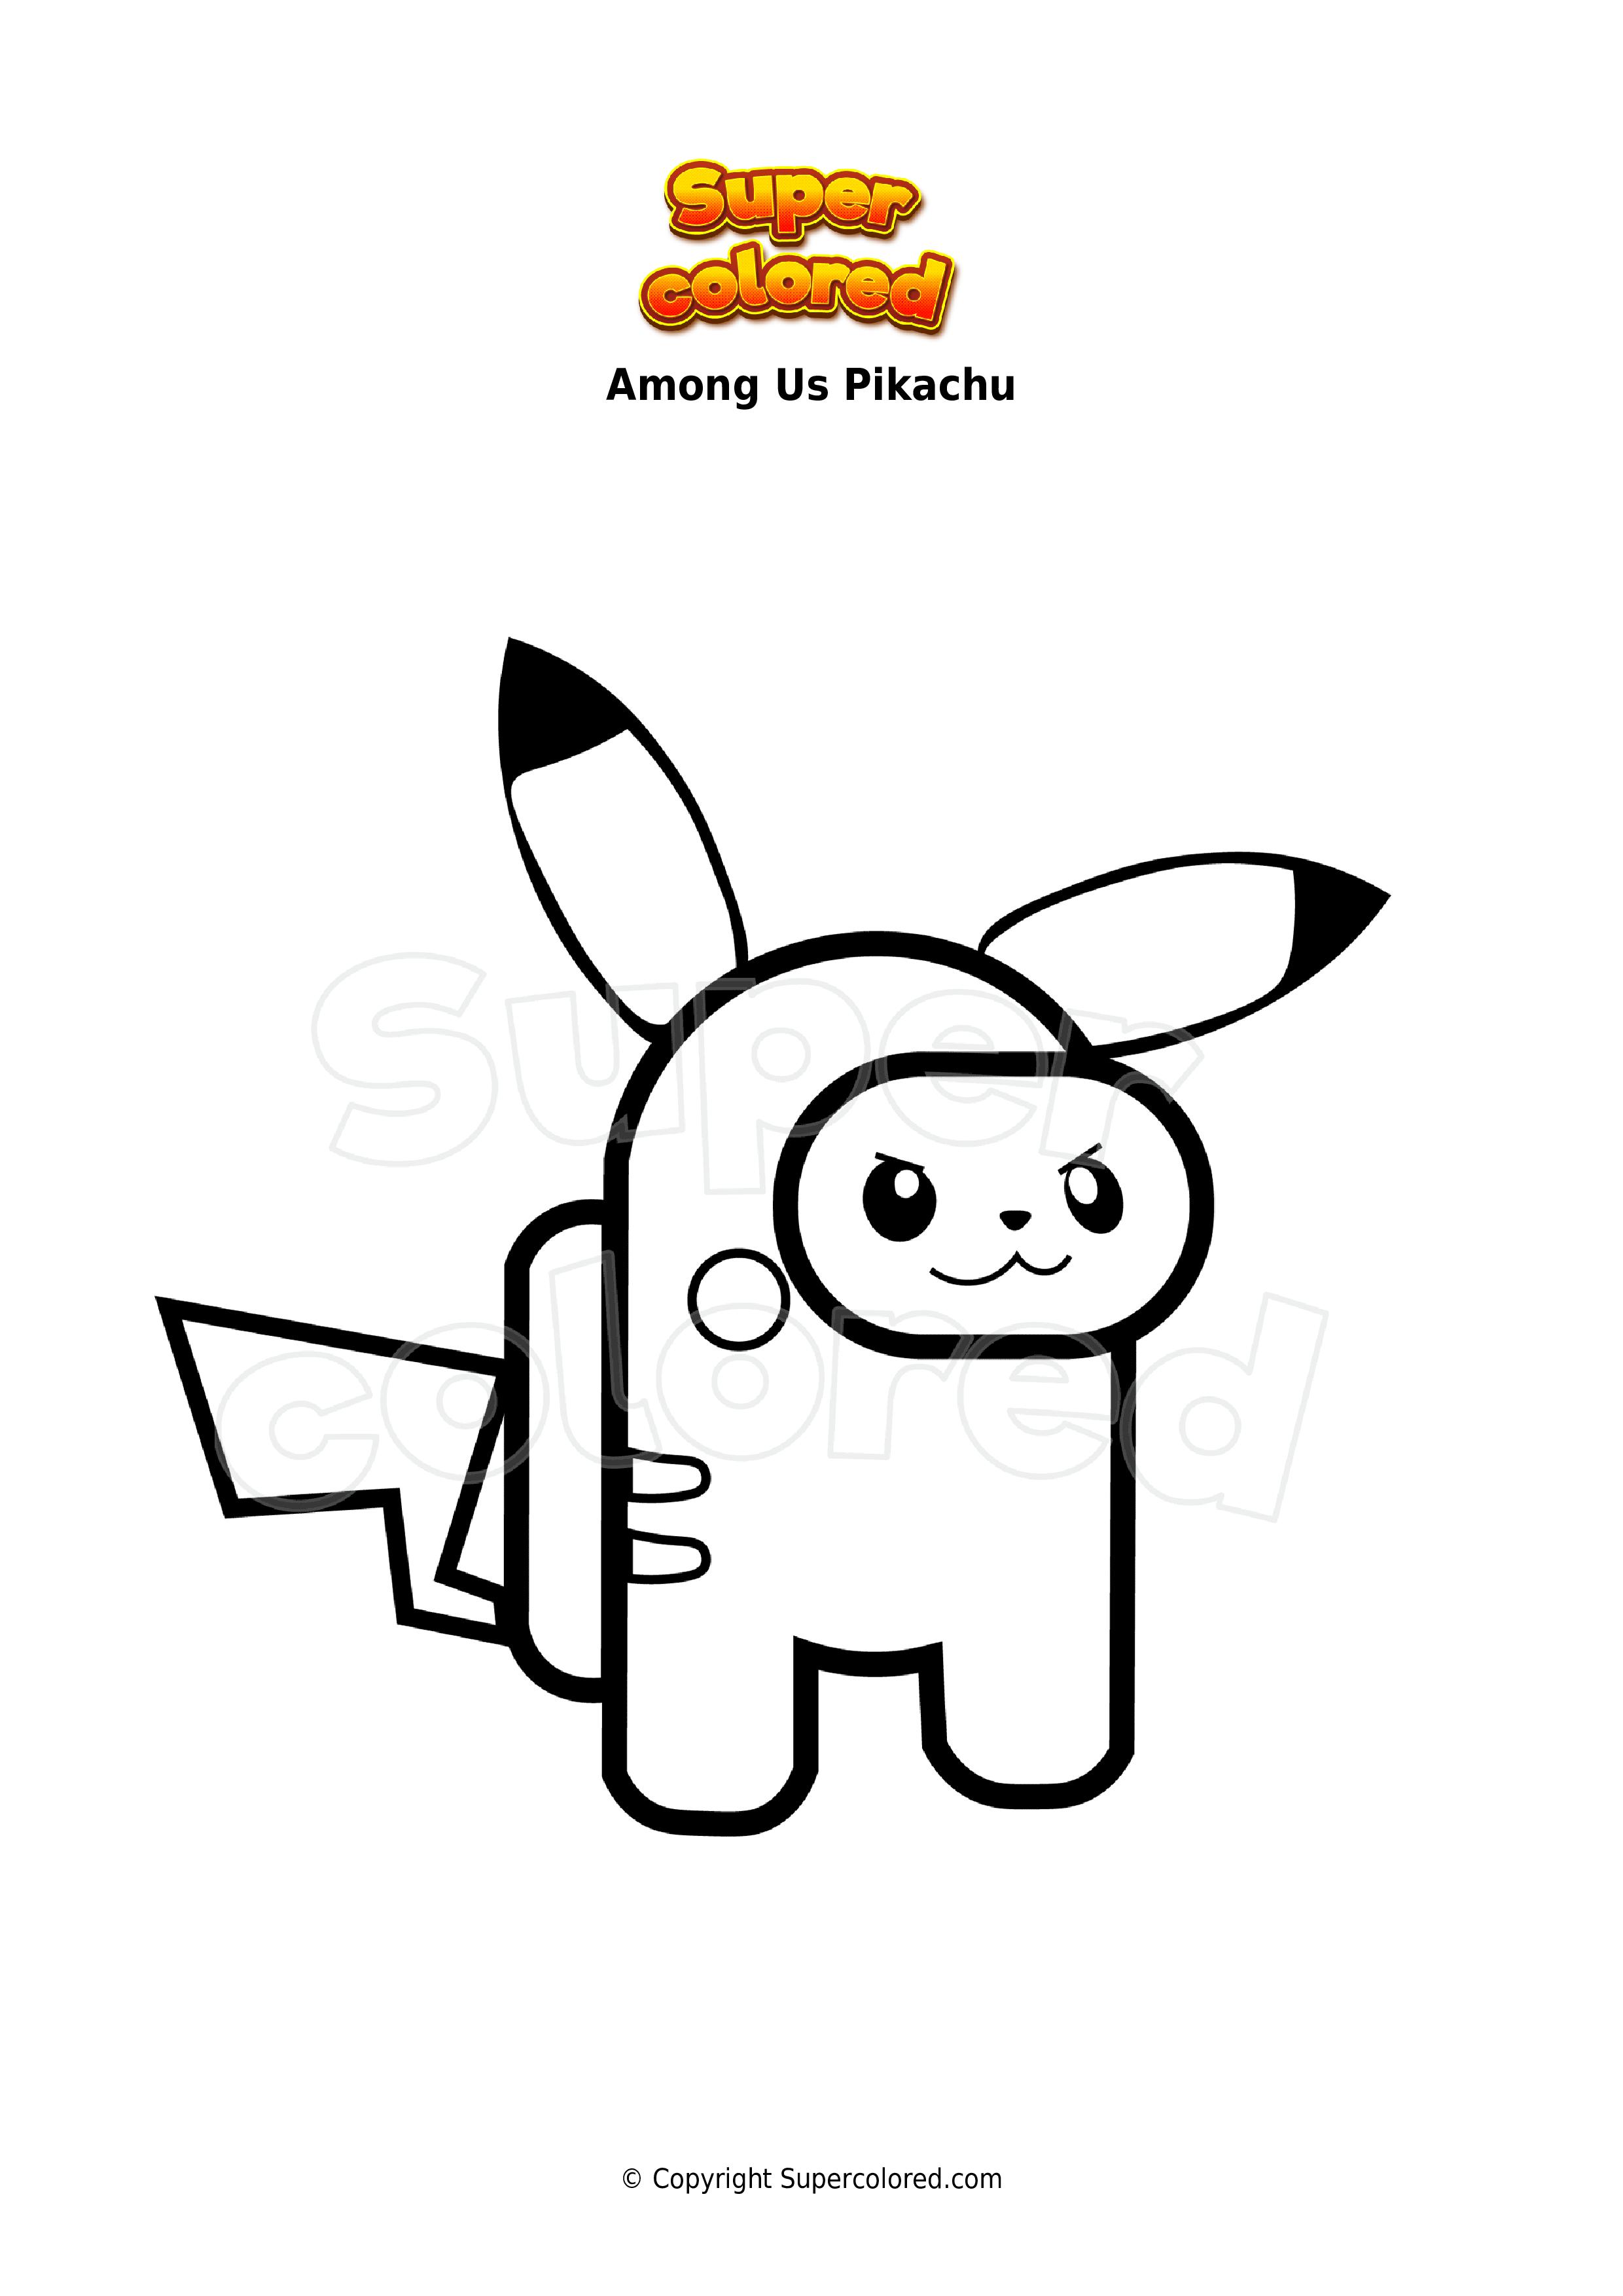 Ausmalbild Among Us Pikachu - Supercolored.com